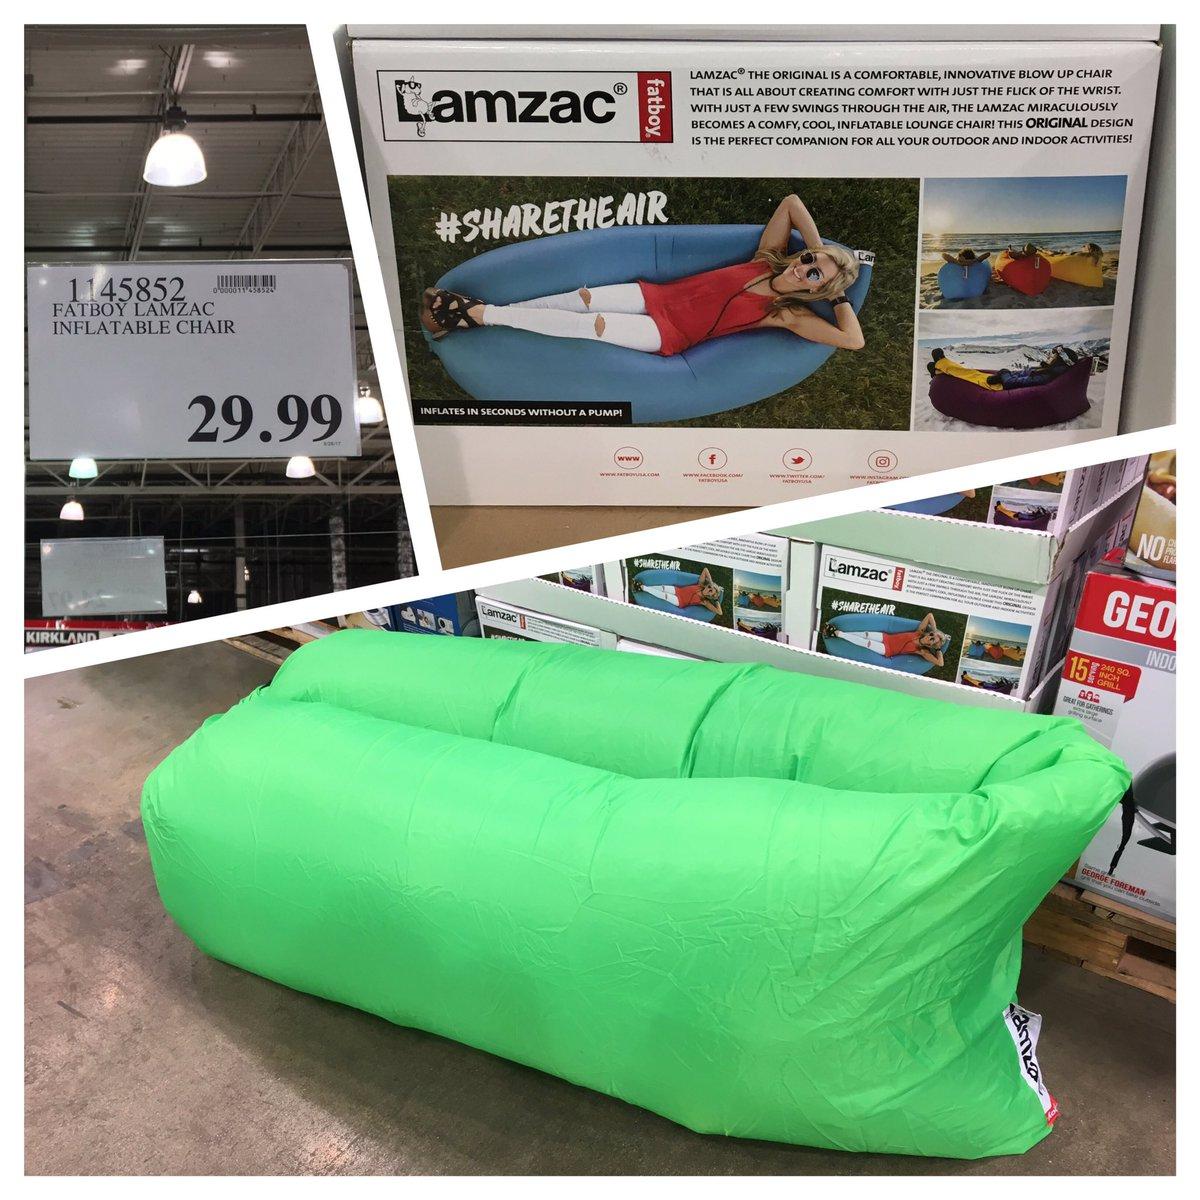 TheCostcoConnoisseur On Twitter FridayFinds Save 50 Off Retail Price FatboyUSA Lamzac Original Inflatable Lounge Chair Costco Lamzactheoriginal